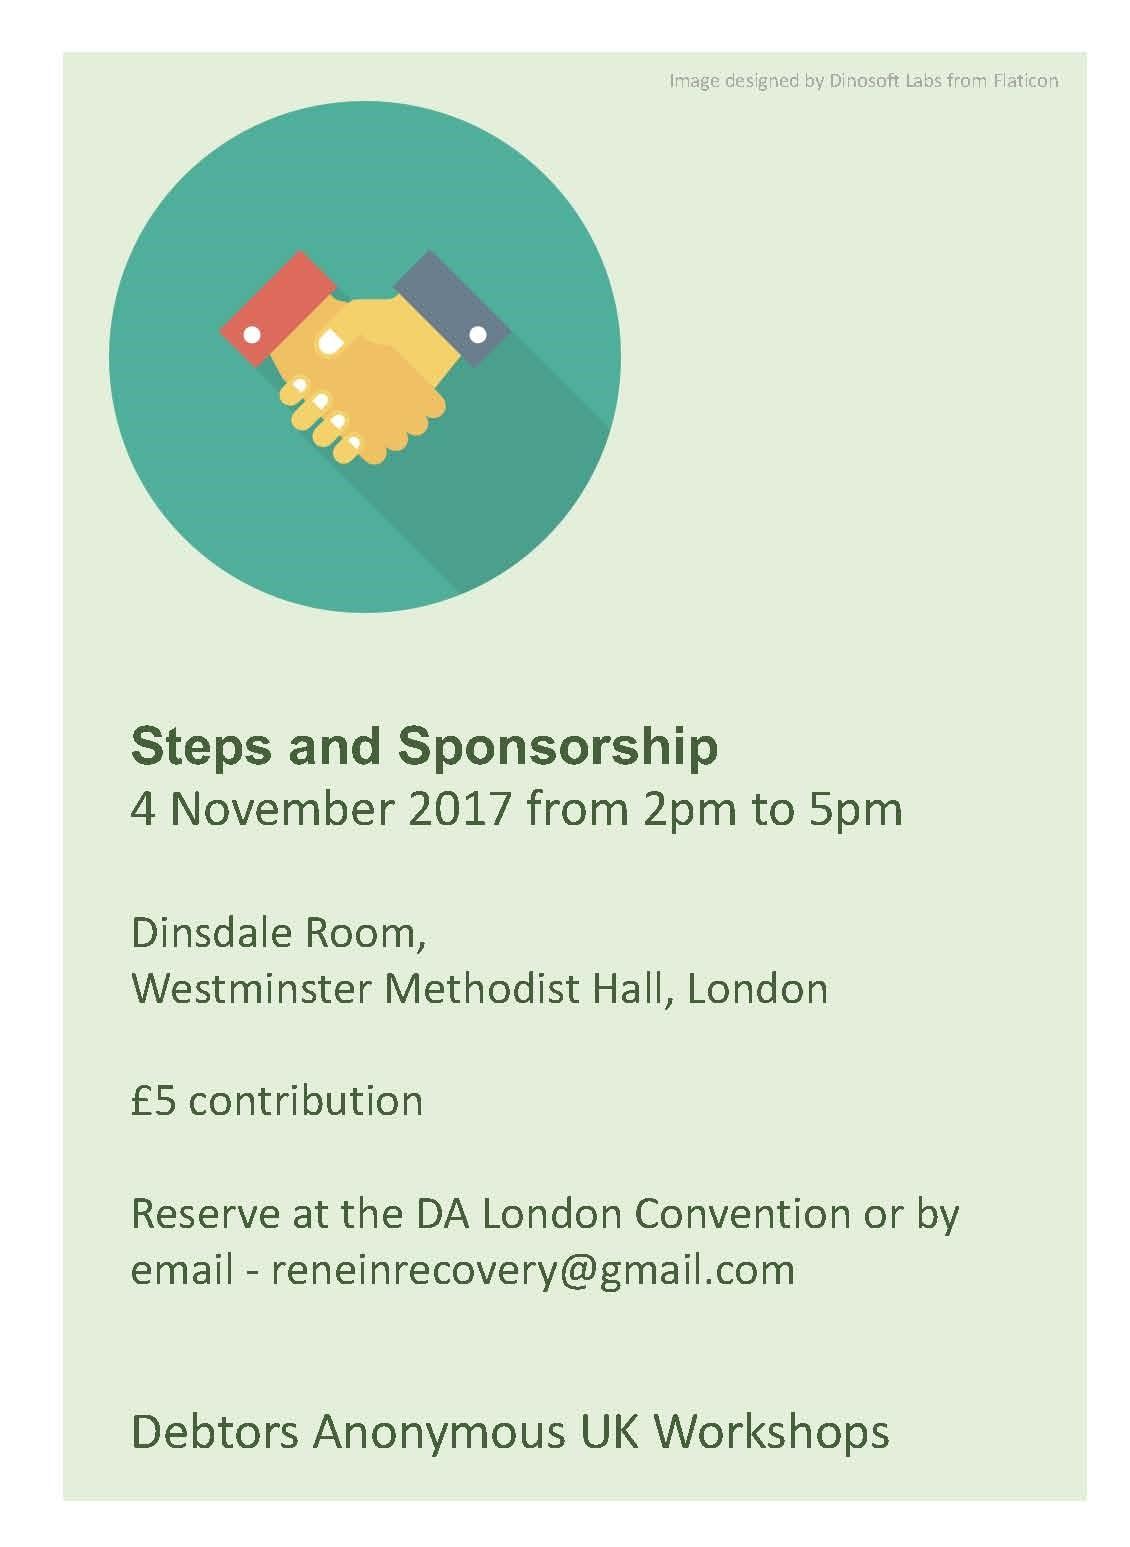 Events Debtors Anonymous UK